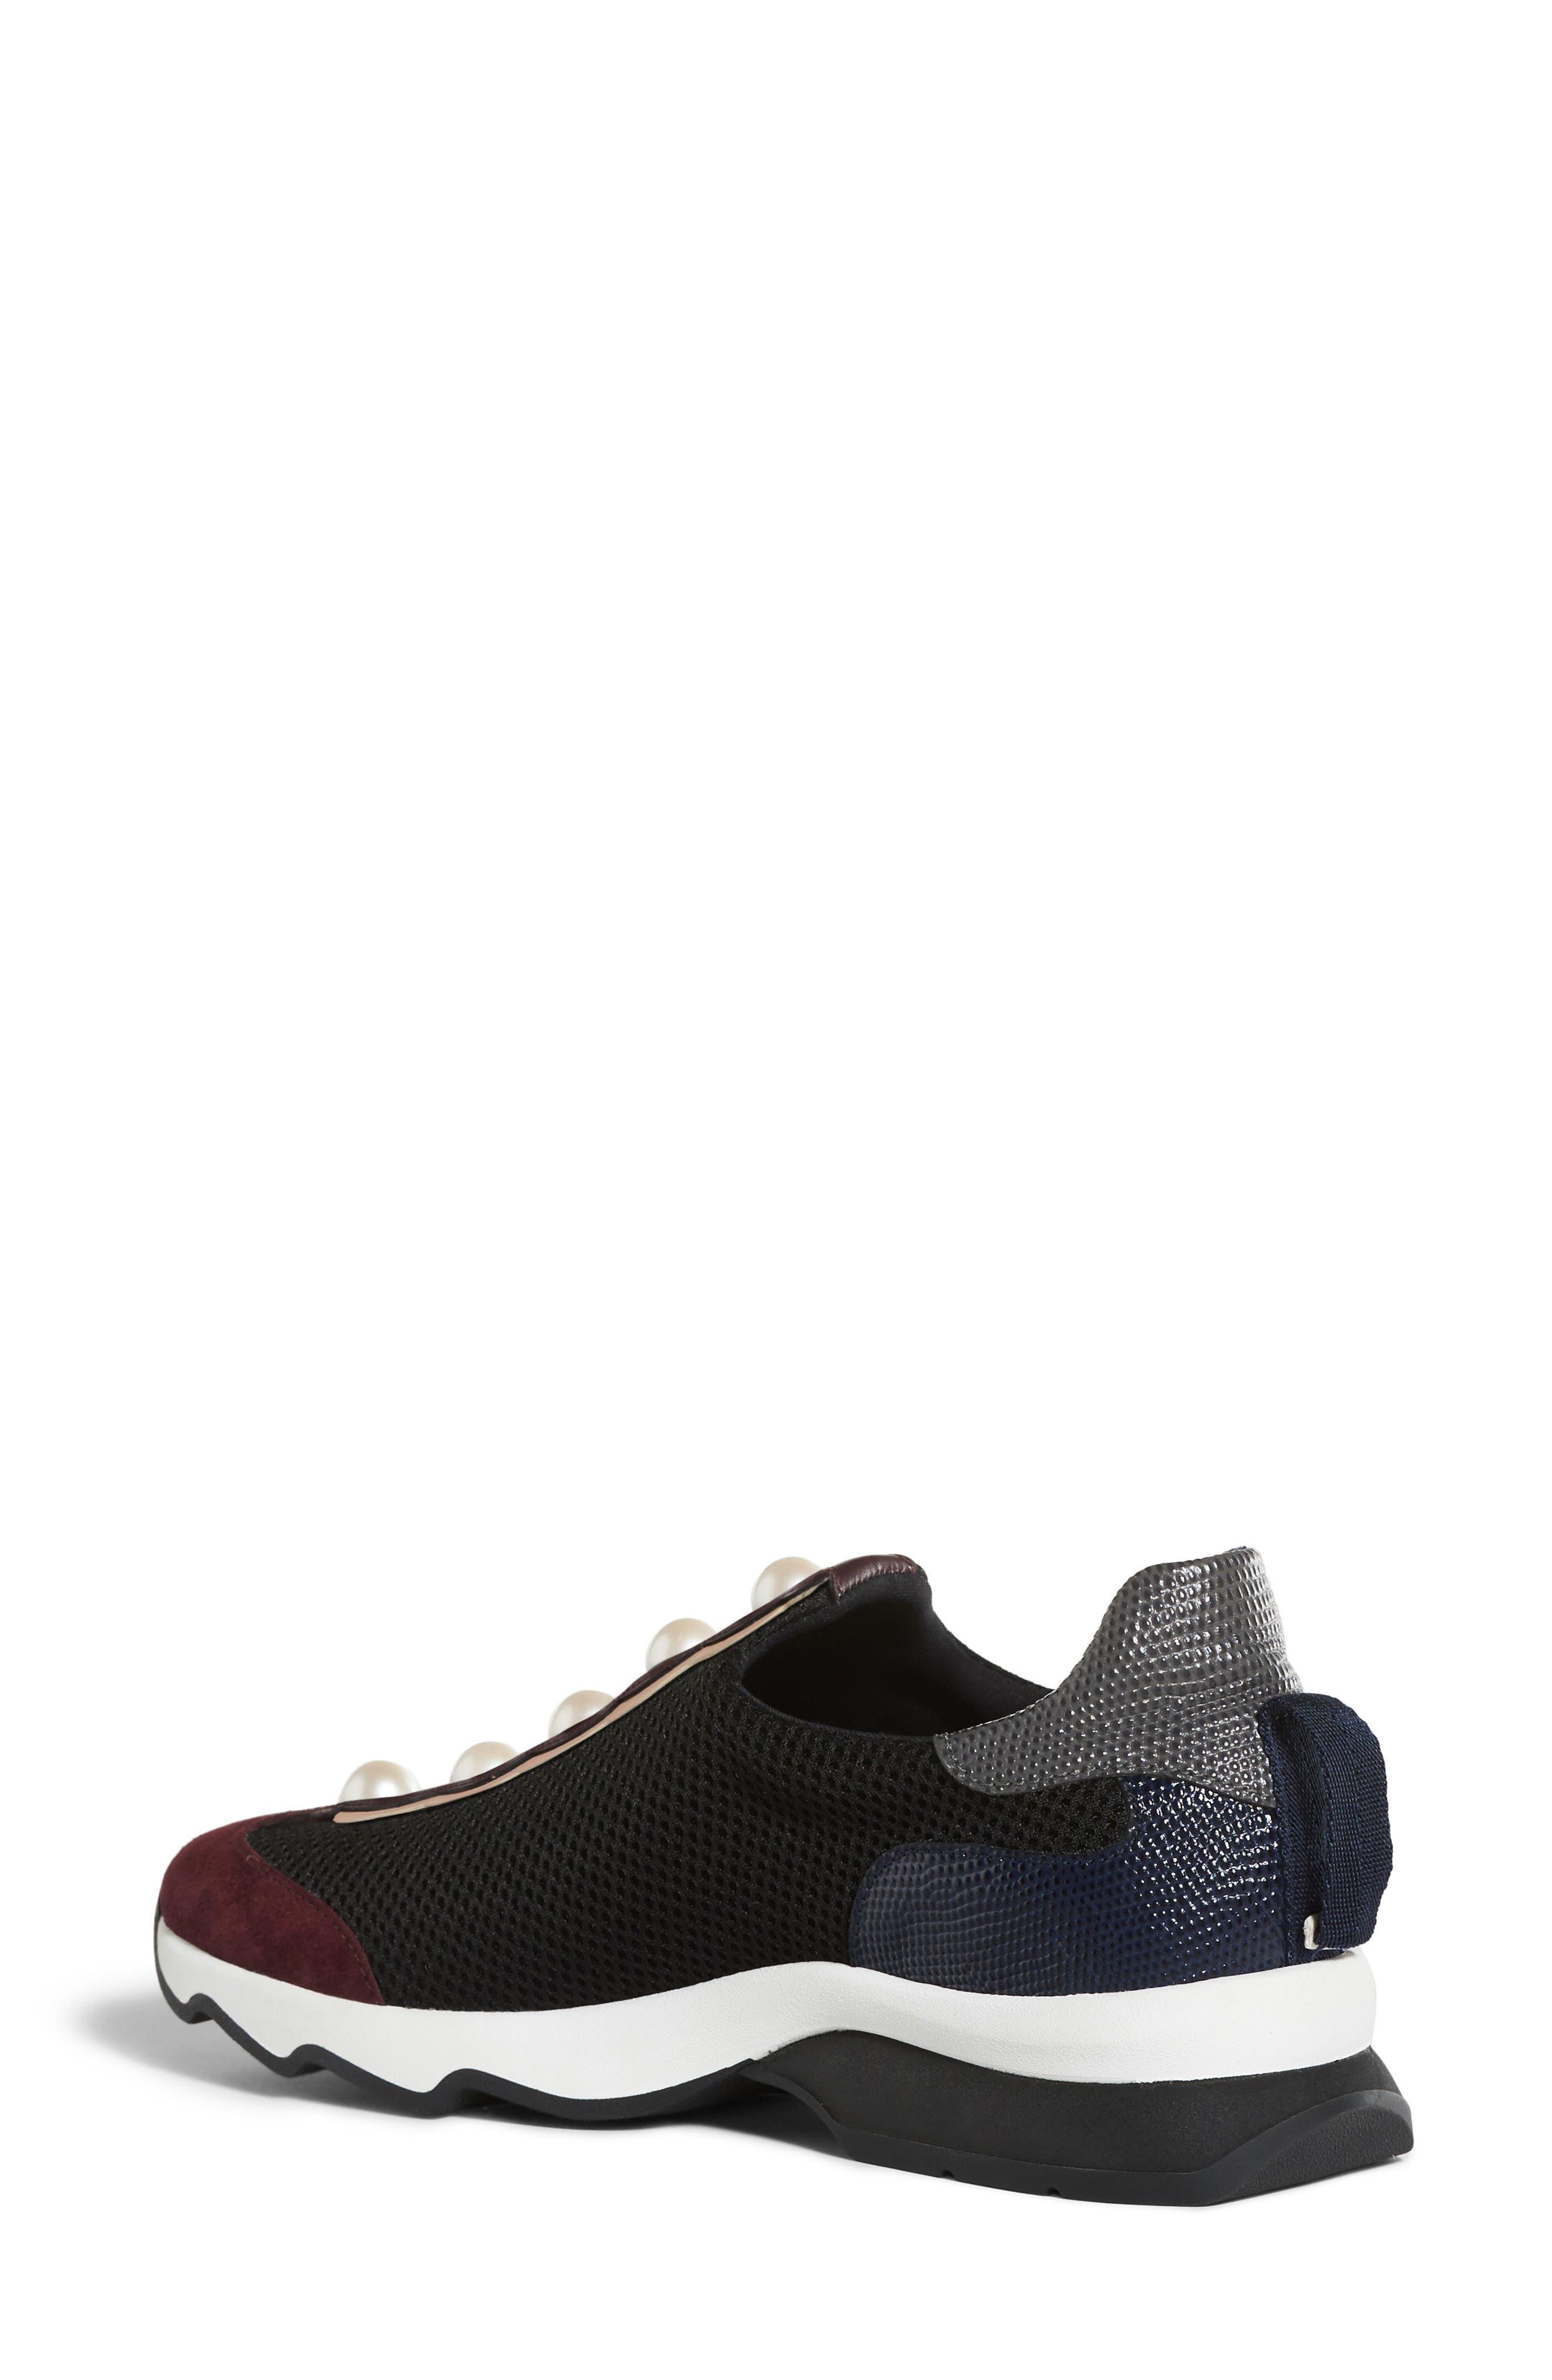 Pearland Slip-On Sneaker,                             Alternate thumbnail 2, color,